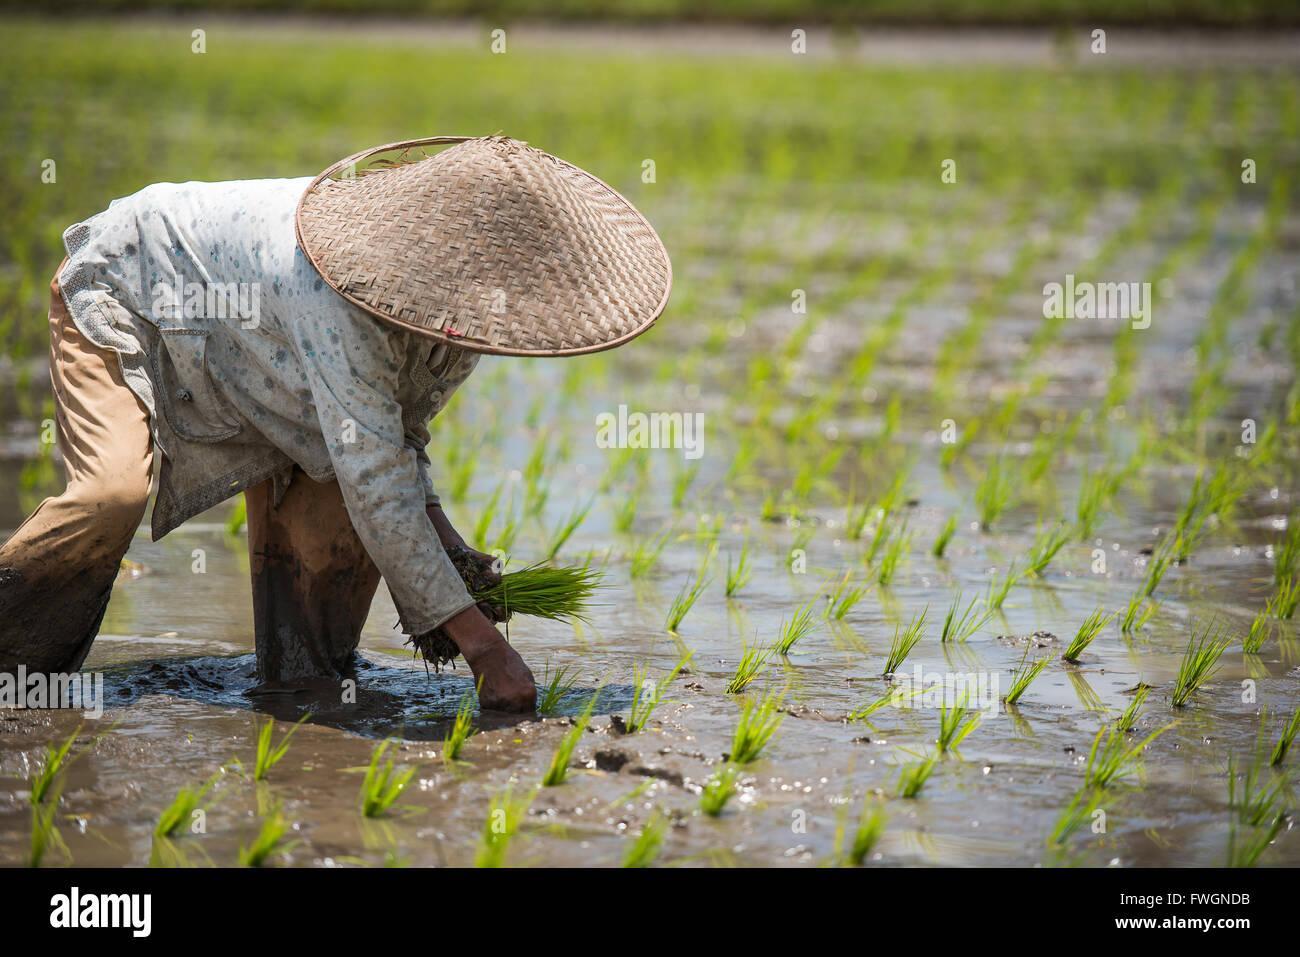 workerin a Padi field, Sumatra, Indonesia, Southeast Asia - Stock Image